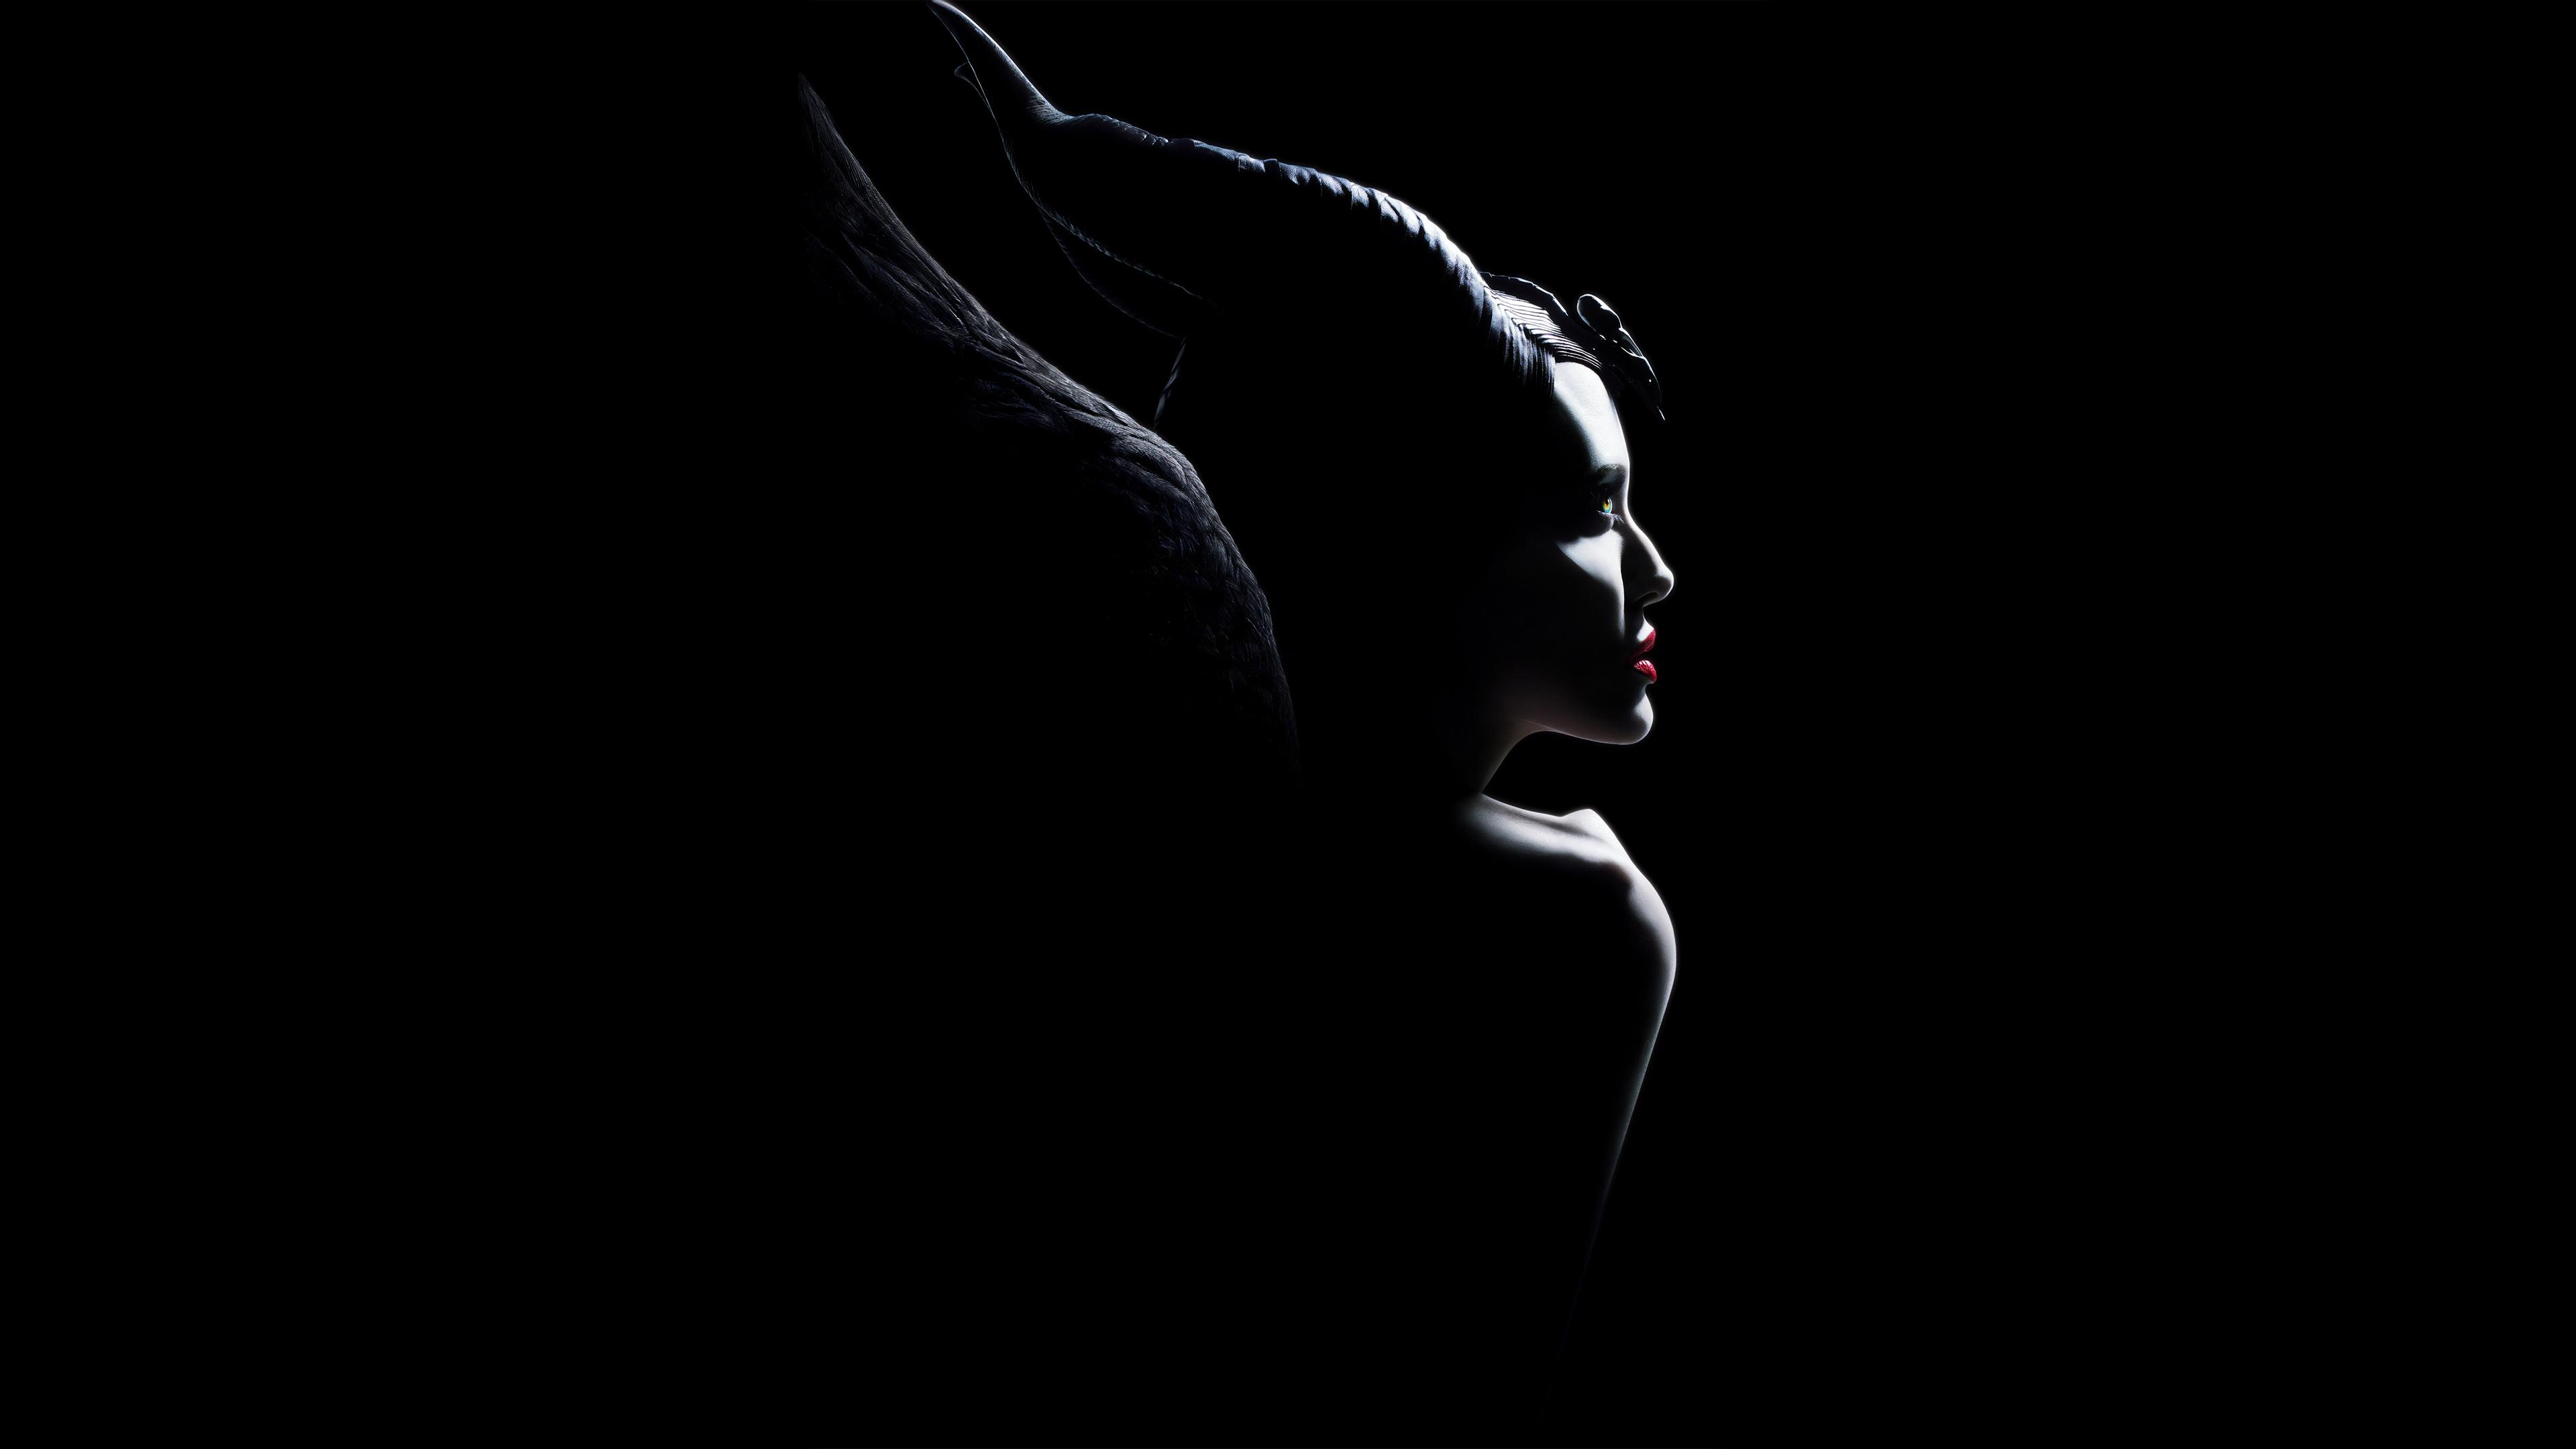 maleficent mistress of evil 2019 4k 1553074132 - Maleficent Mistress Of Evil 2019 4k - movies wallpapers, maleficent wallpapers, maleficent mistress of evil wallpapers, hd-wallpapers, angelina jolie wallpapers, 5k wallpapers, 4k-wallpapers, 2019 movies wallpapers